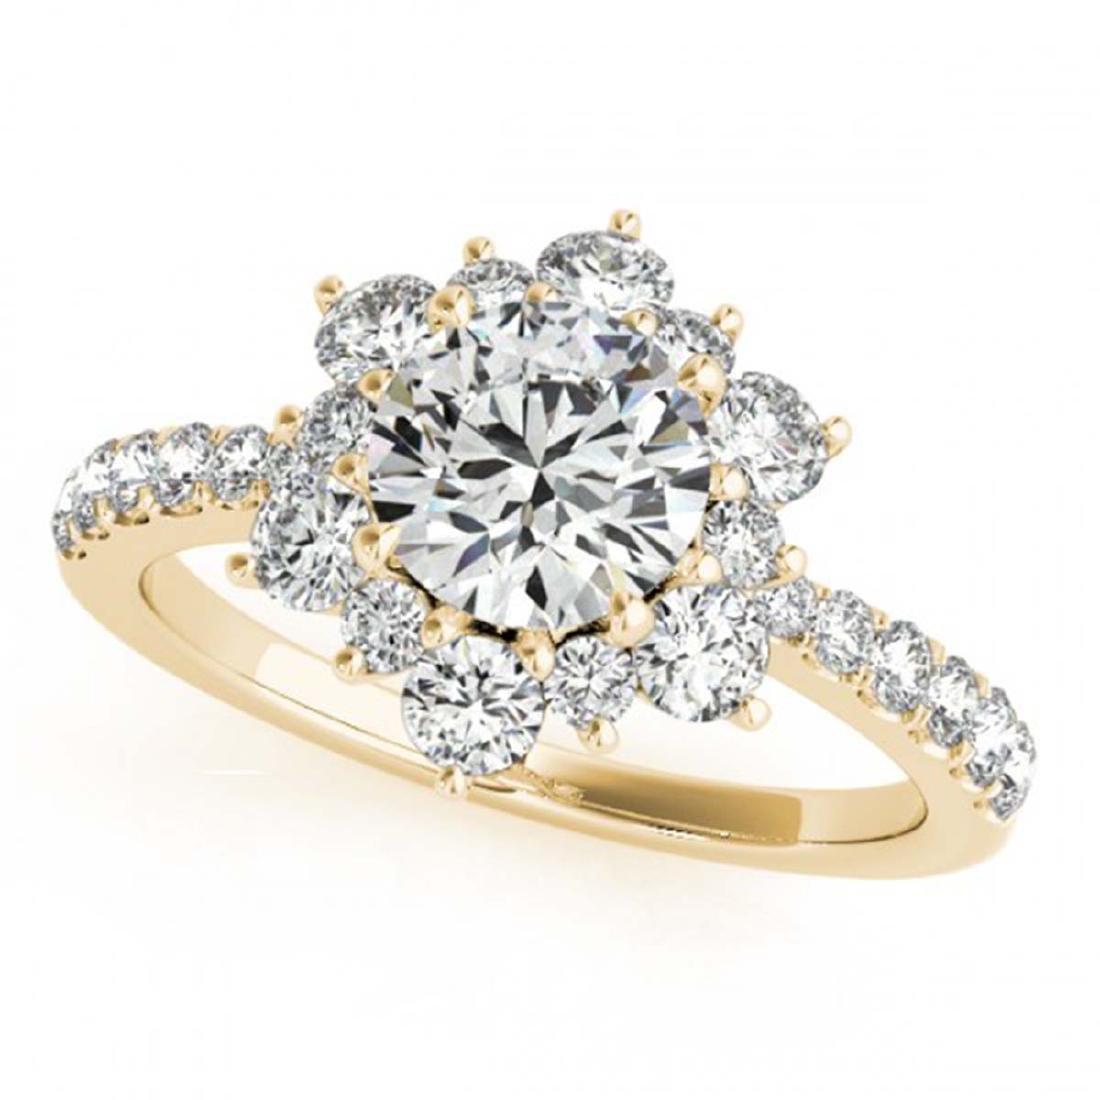 2.19 ctw VS/SI Diamond Halo Ring 18K Yellow Gold -